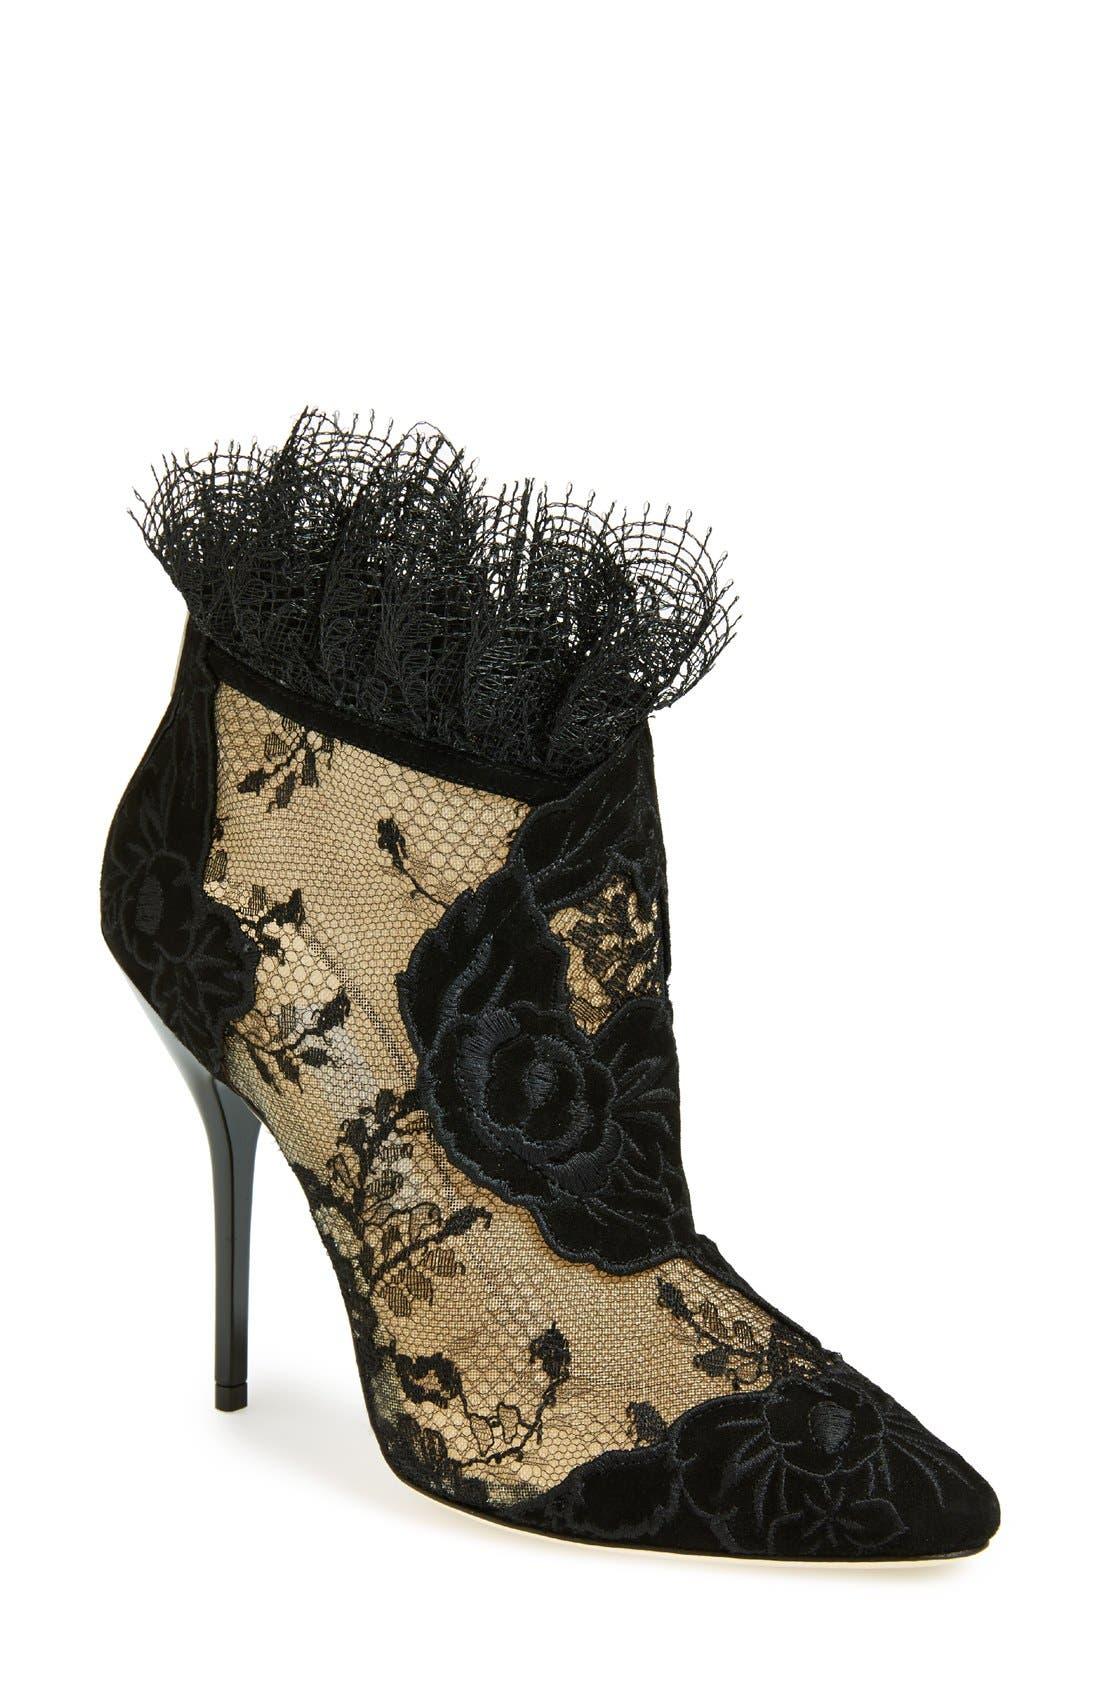 Alternate Image 1 Selected - Jimmy Choo 'Kamaris' Lace Ankle Bootie (Women)